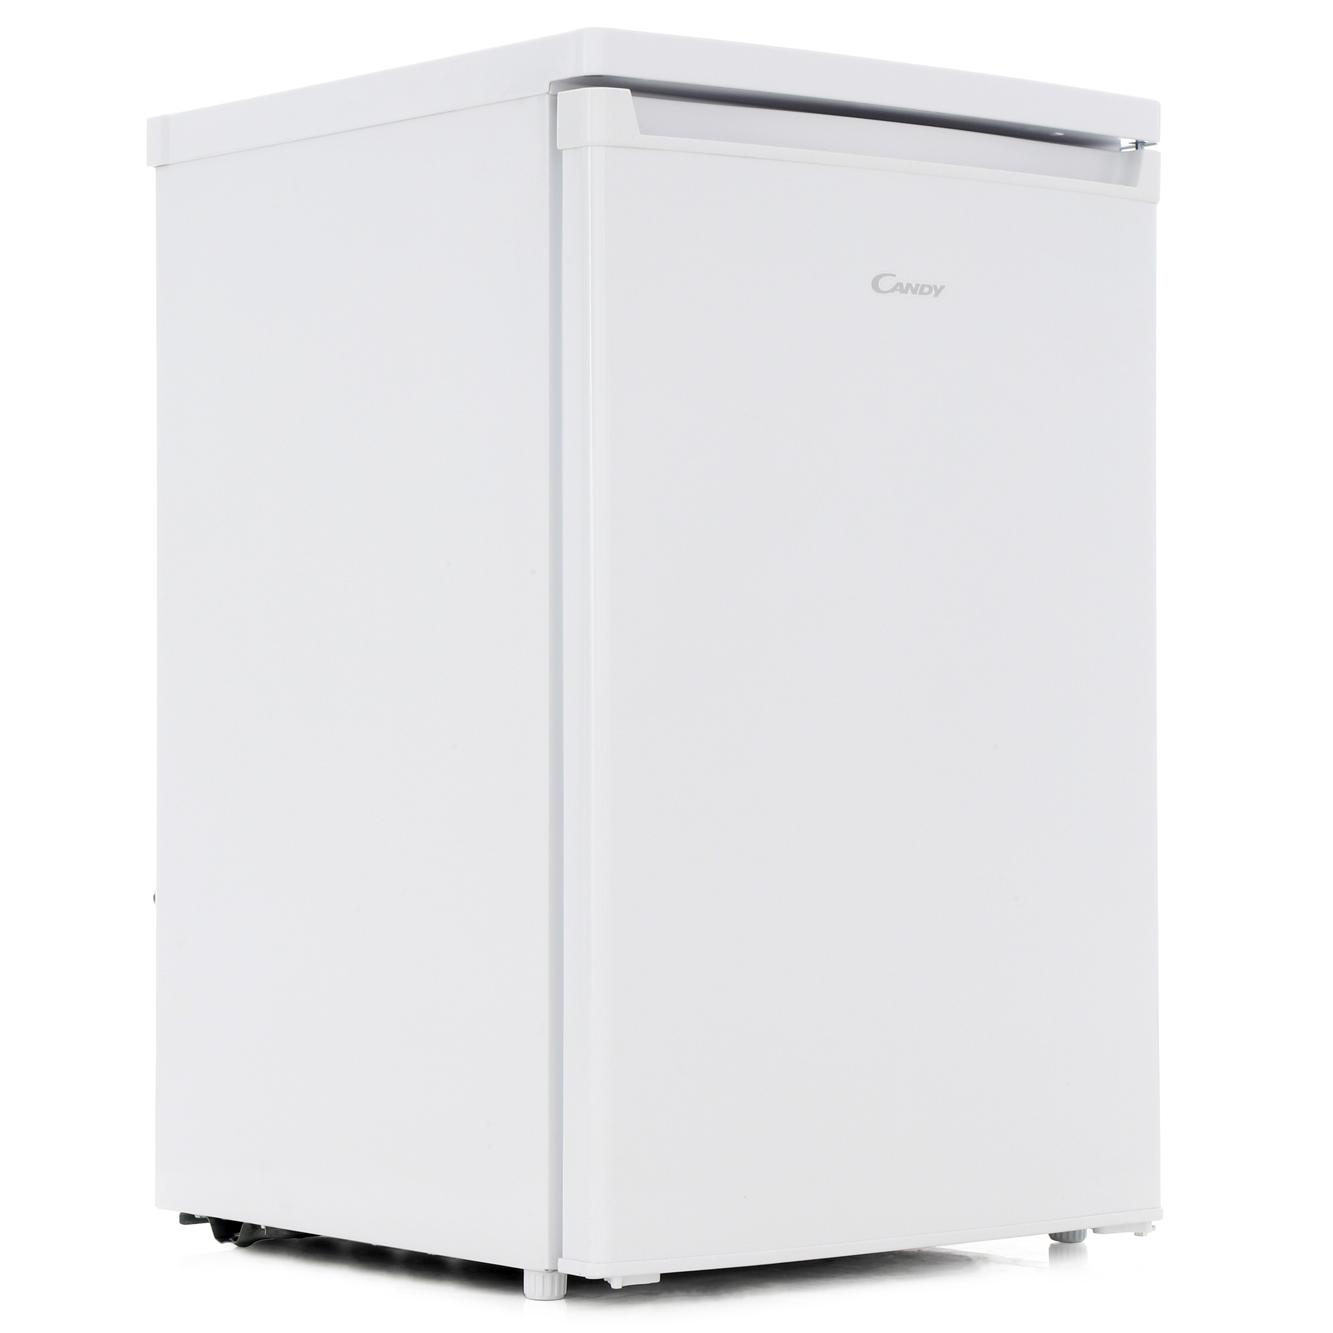 Candy CFOE5485WE Fridge with Ice Box